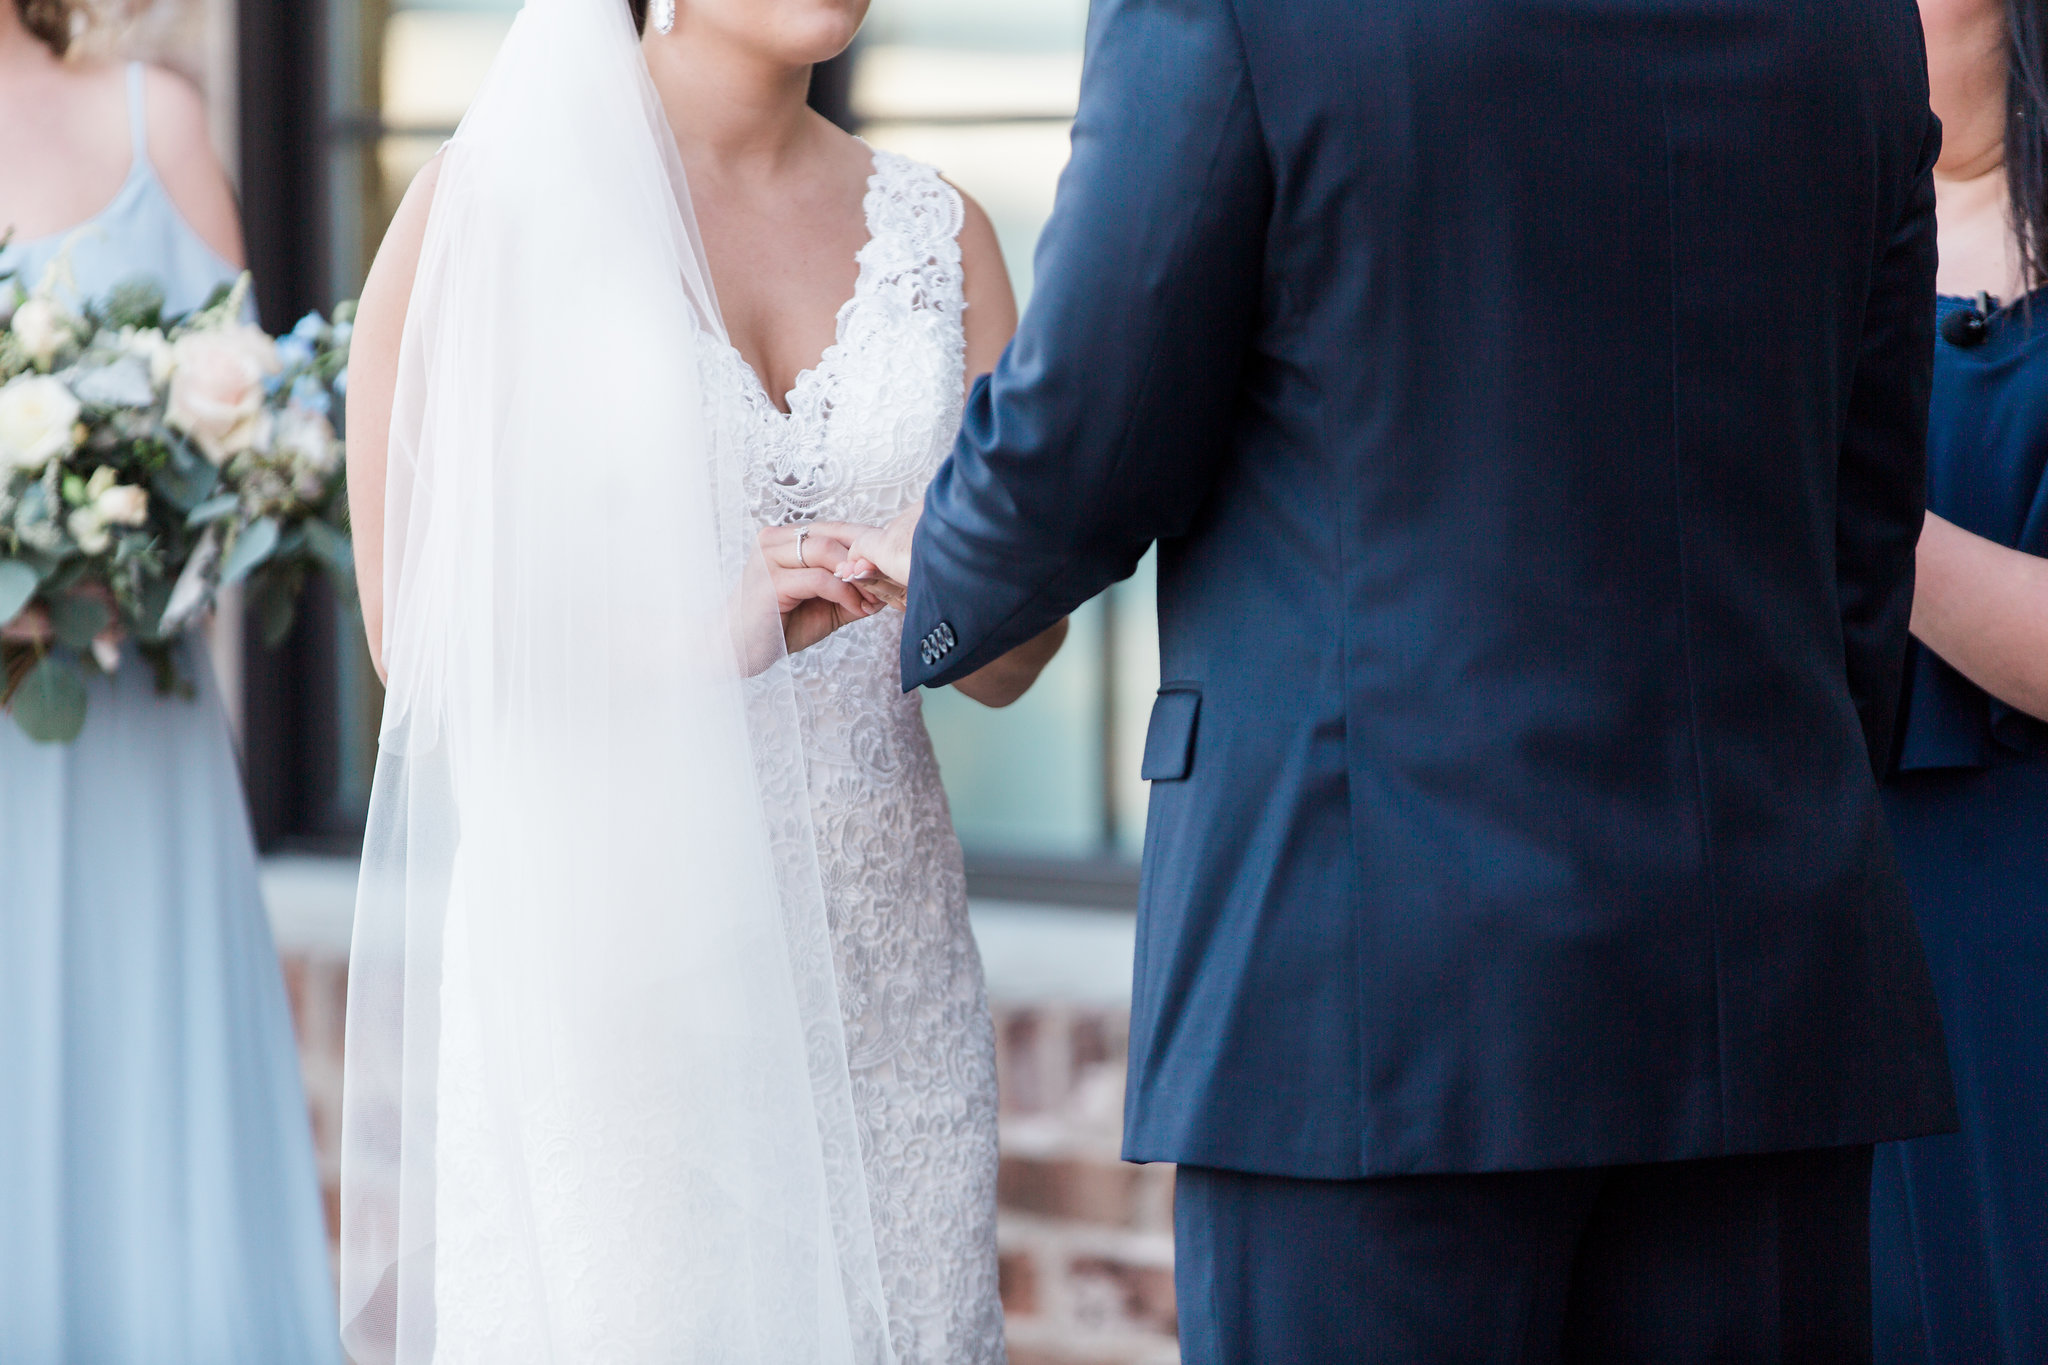 apt-b-photography-Savannah-wedding-photographer-savannah-engagement-photographer-historic-savannah-engagement-charles-h-morris-center-wedding-savannah-weddings-39.JPG